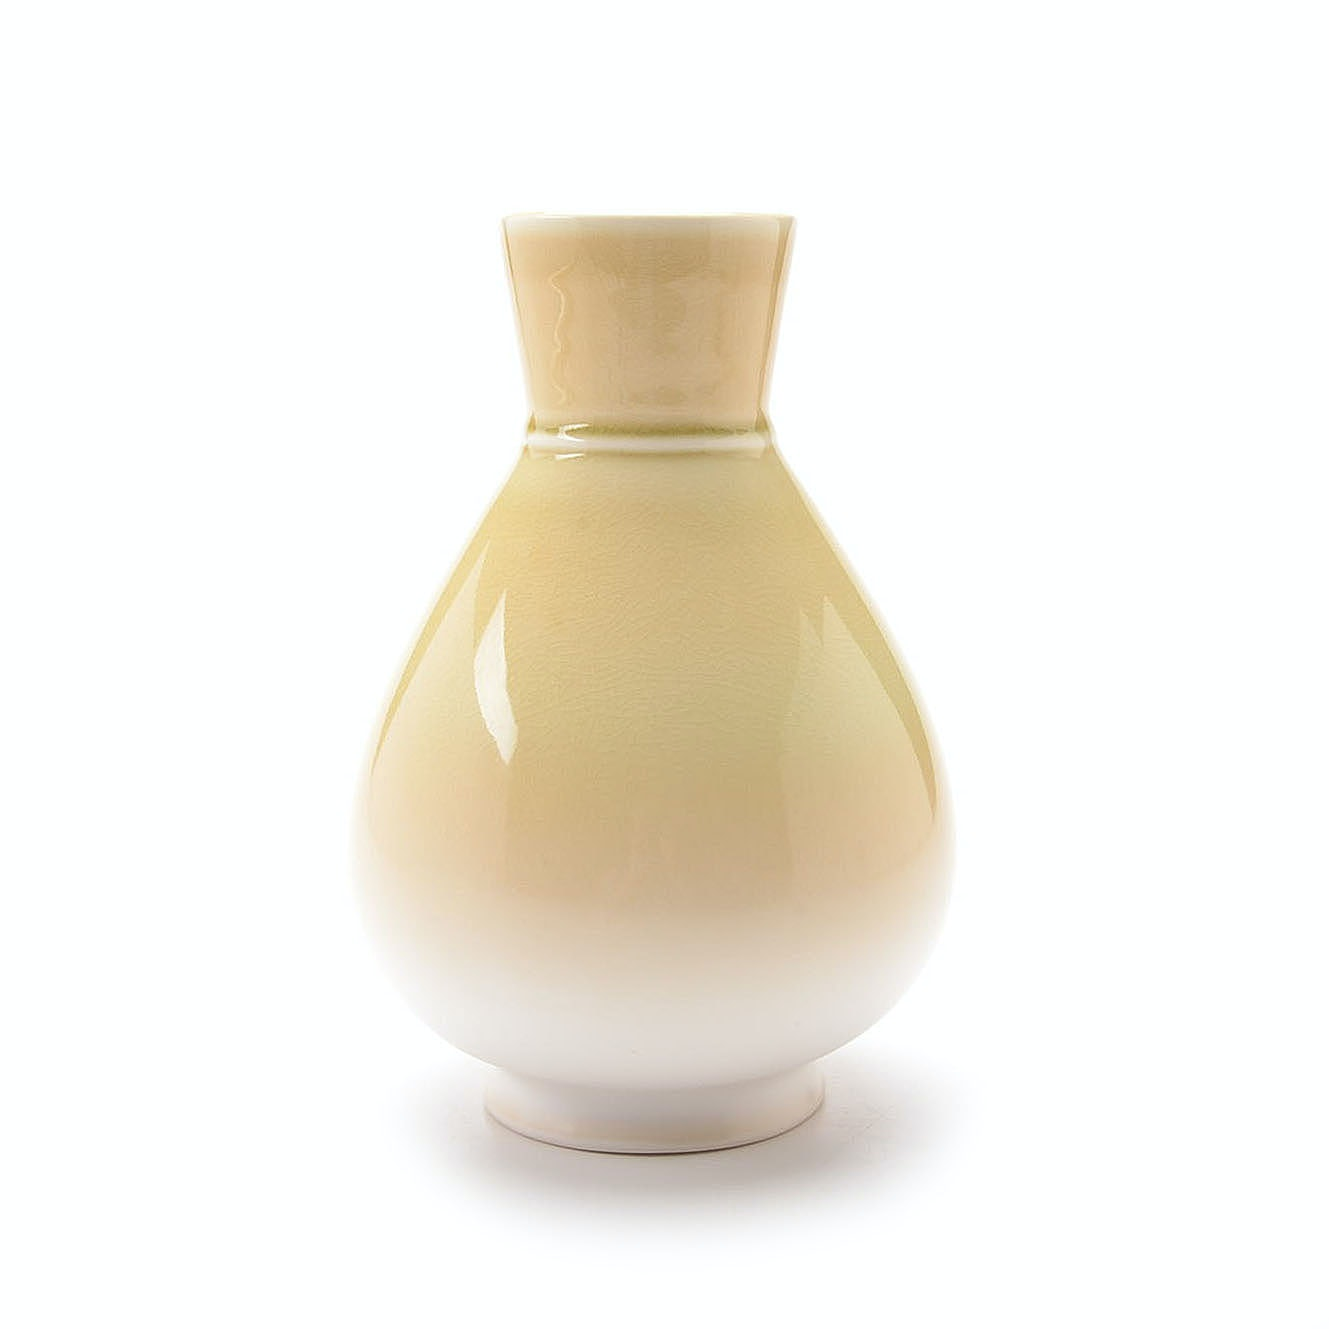 Rookwood Art Pottery Citrine Alkaline Teardrop Vase